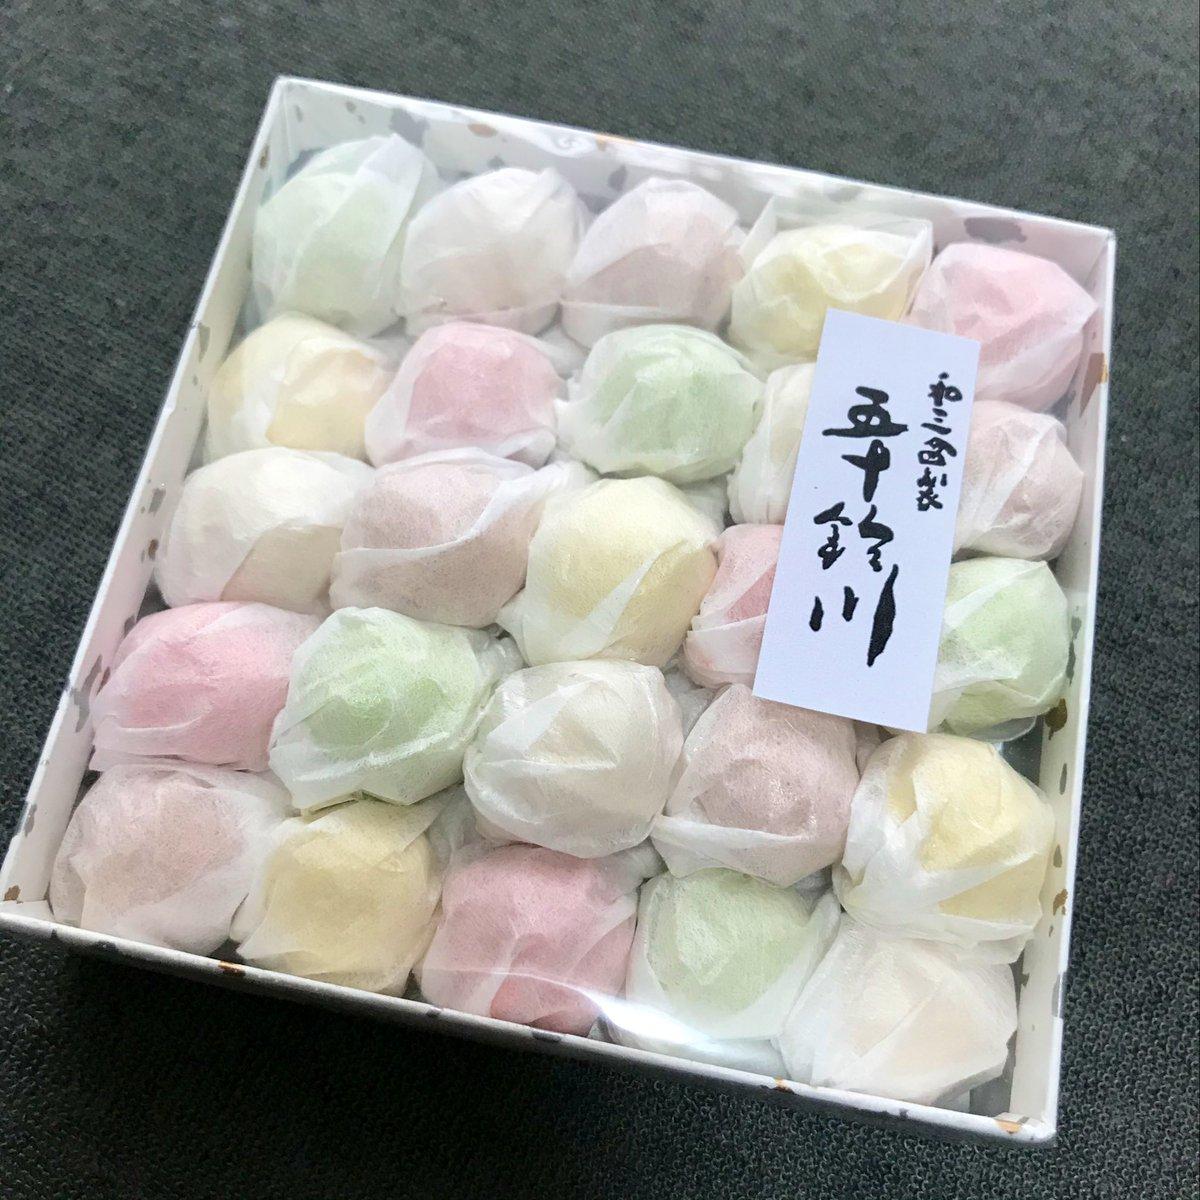 test ツイッターメディア - わーい!和三盆! 砂糖の塊なんだけどすごく美味しいんだよ…! https://t.co/RFsJJ91cxn